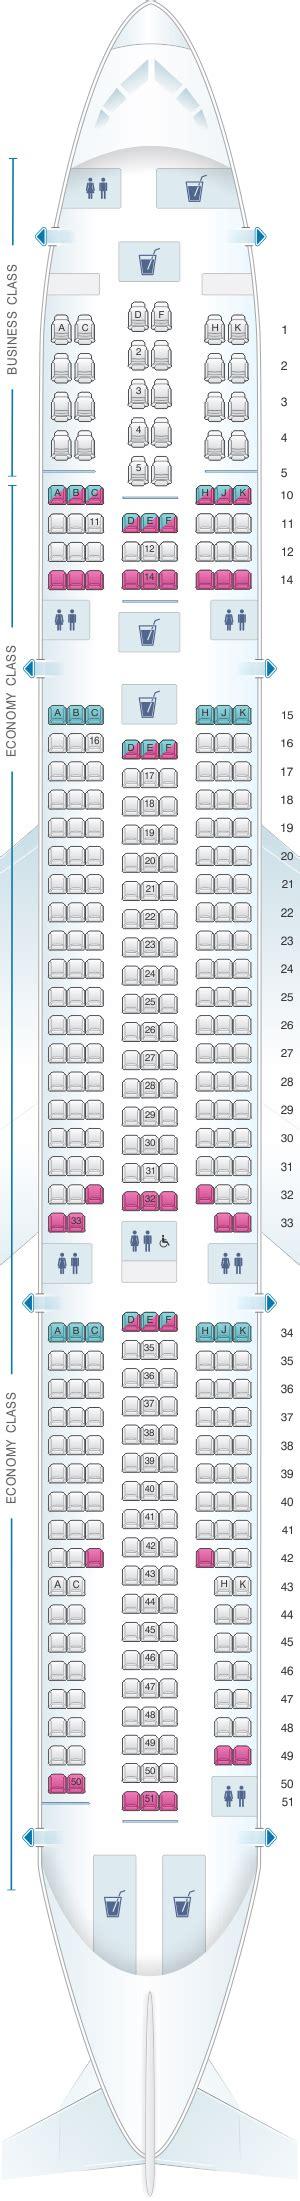 siege seat plan de cabine corsair airbus a330 300 seatmaestro fr